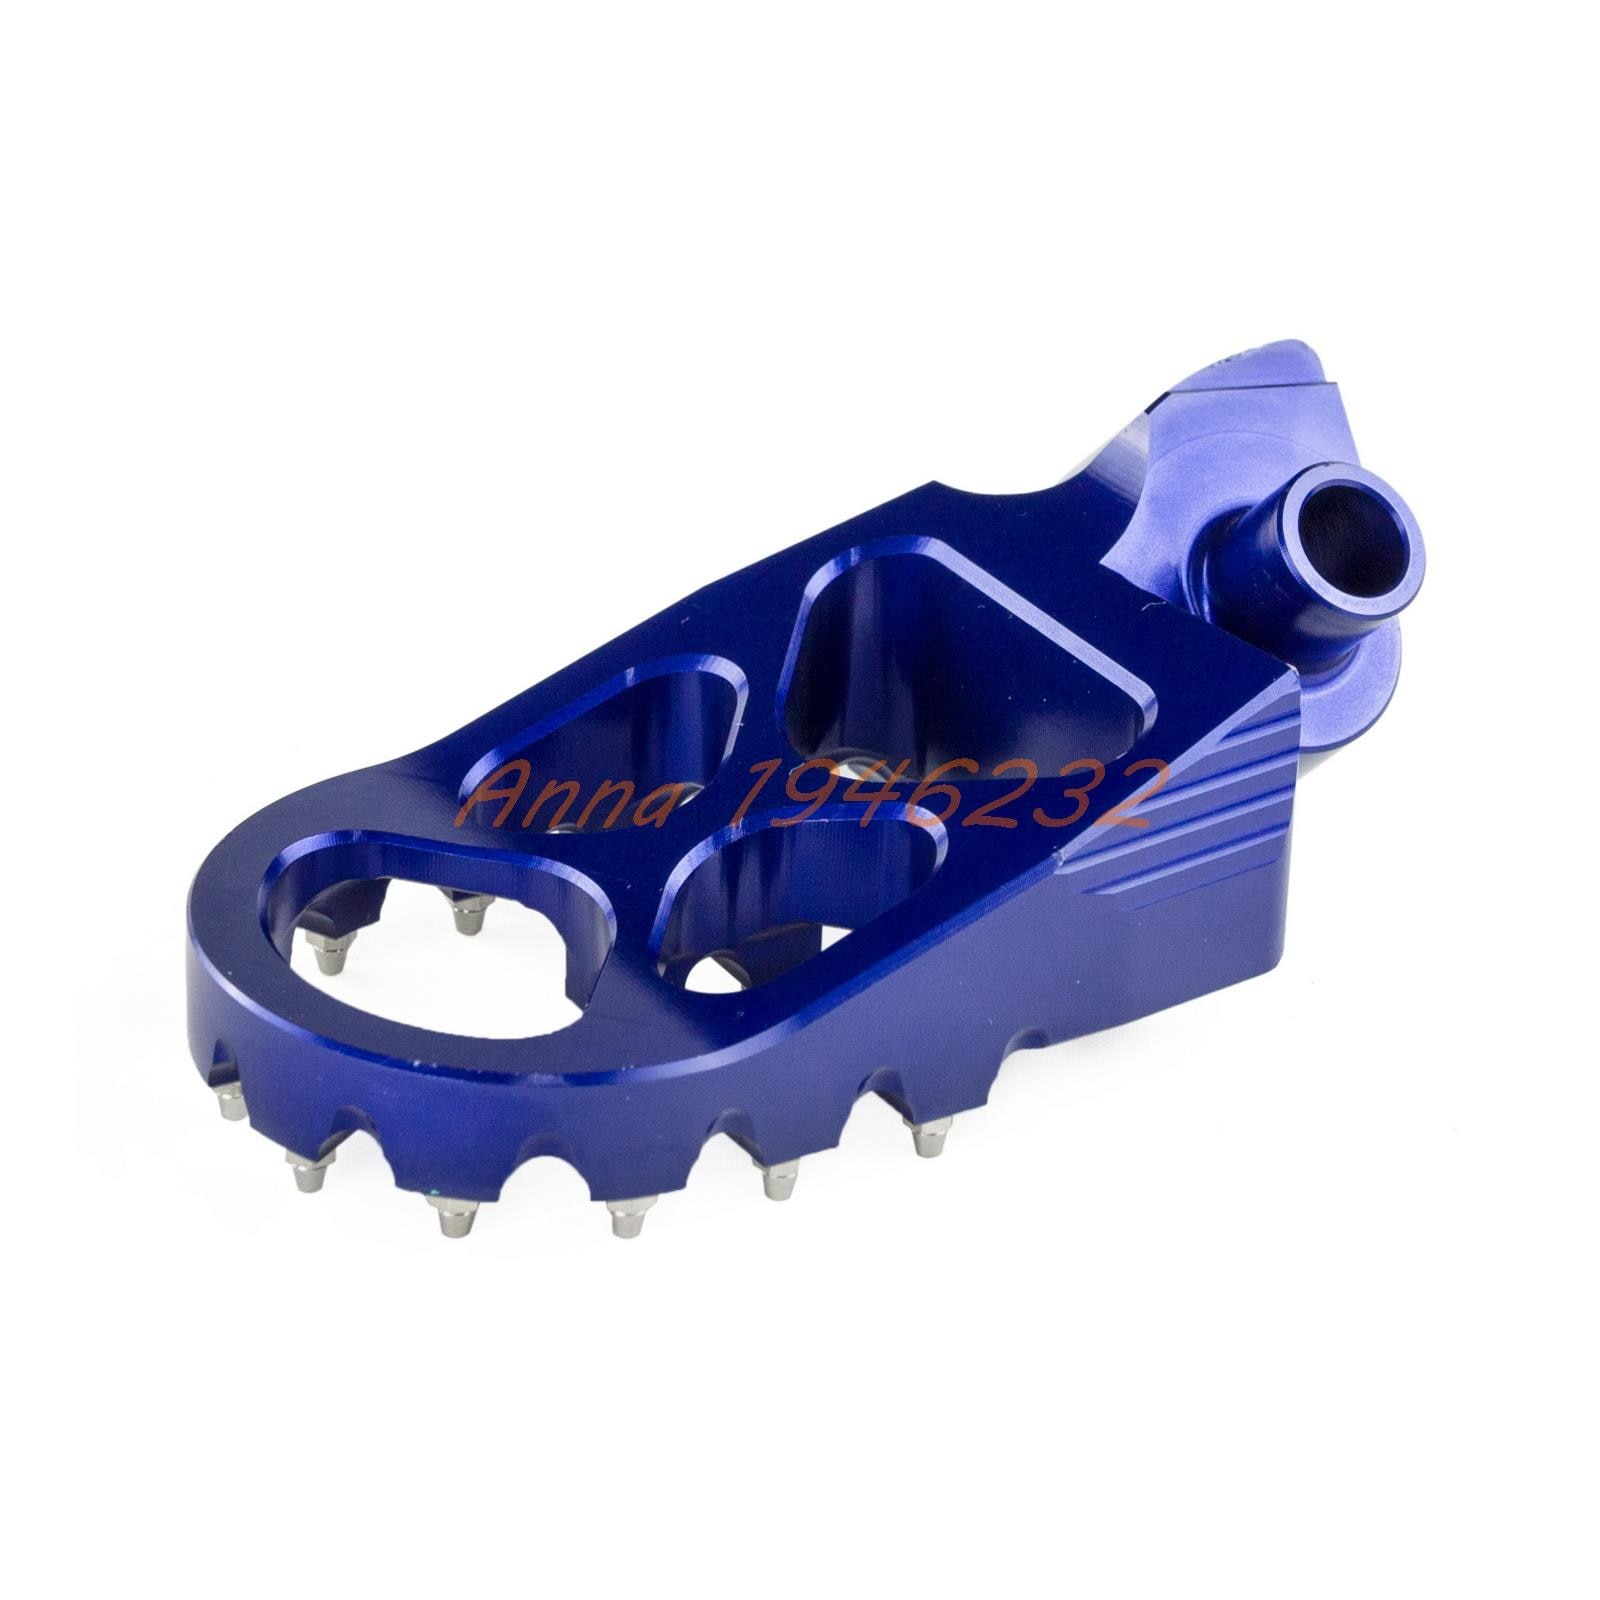 57mm-7075-Blue-Wide-Footrests-Foot-Pegs-For-Yamaha-YZ85-YZ125-YZ250-YZ125X-YZ250X-YZ250F-YZ450F-3